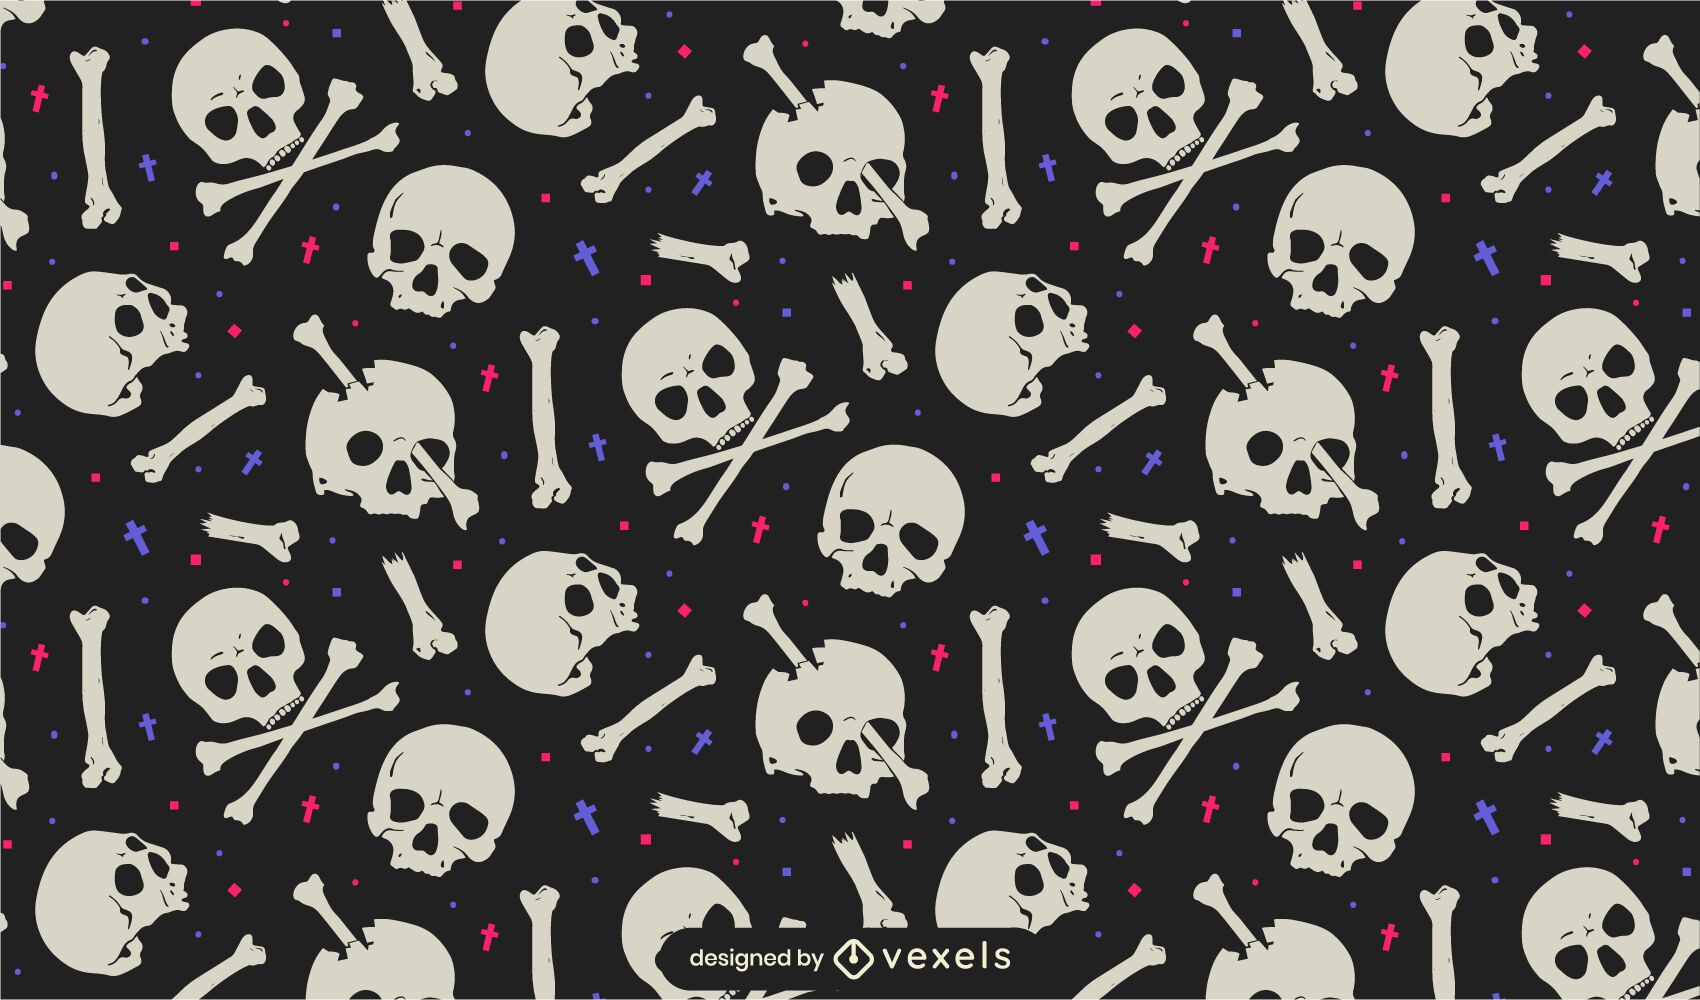 Skulls and bones pattern design